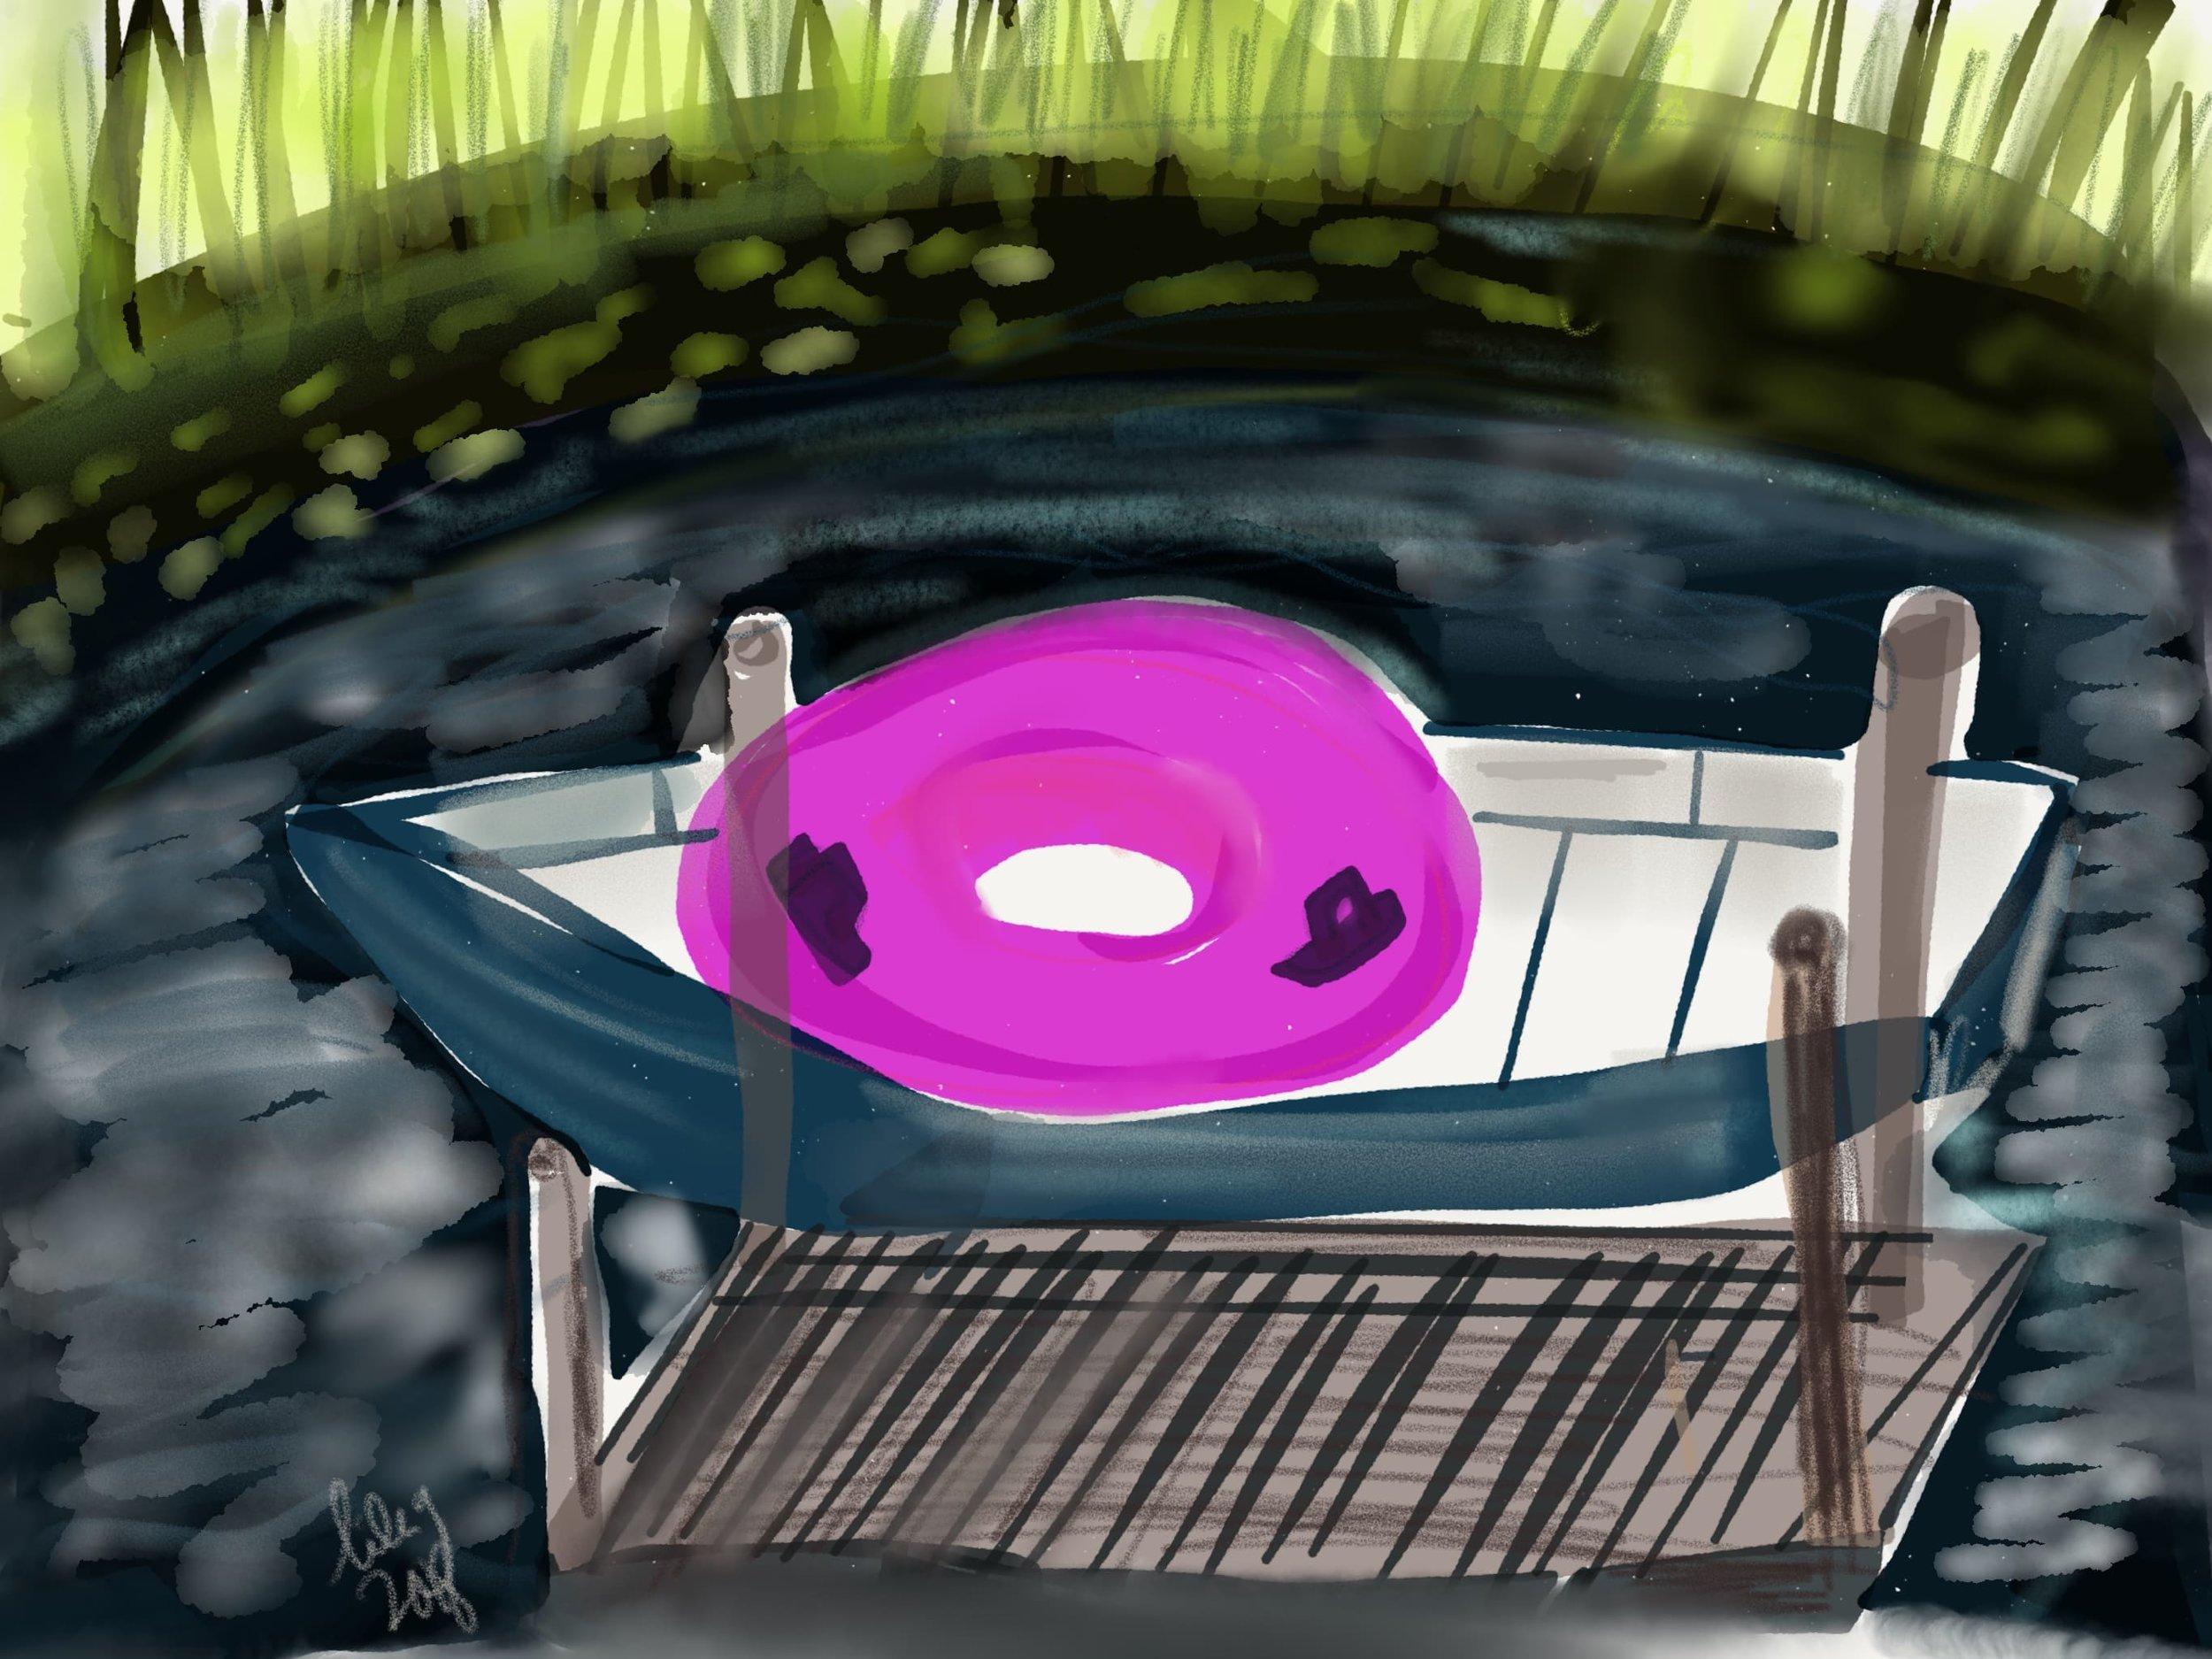 2018-rowboat-n-pink-donut-nomi.jpg